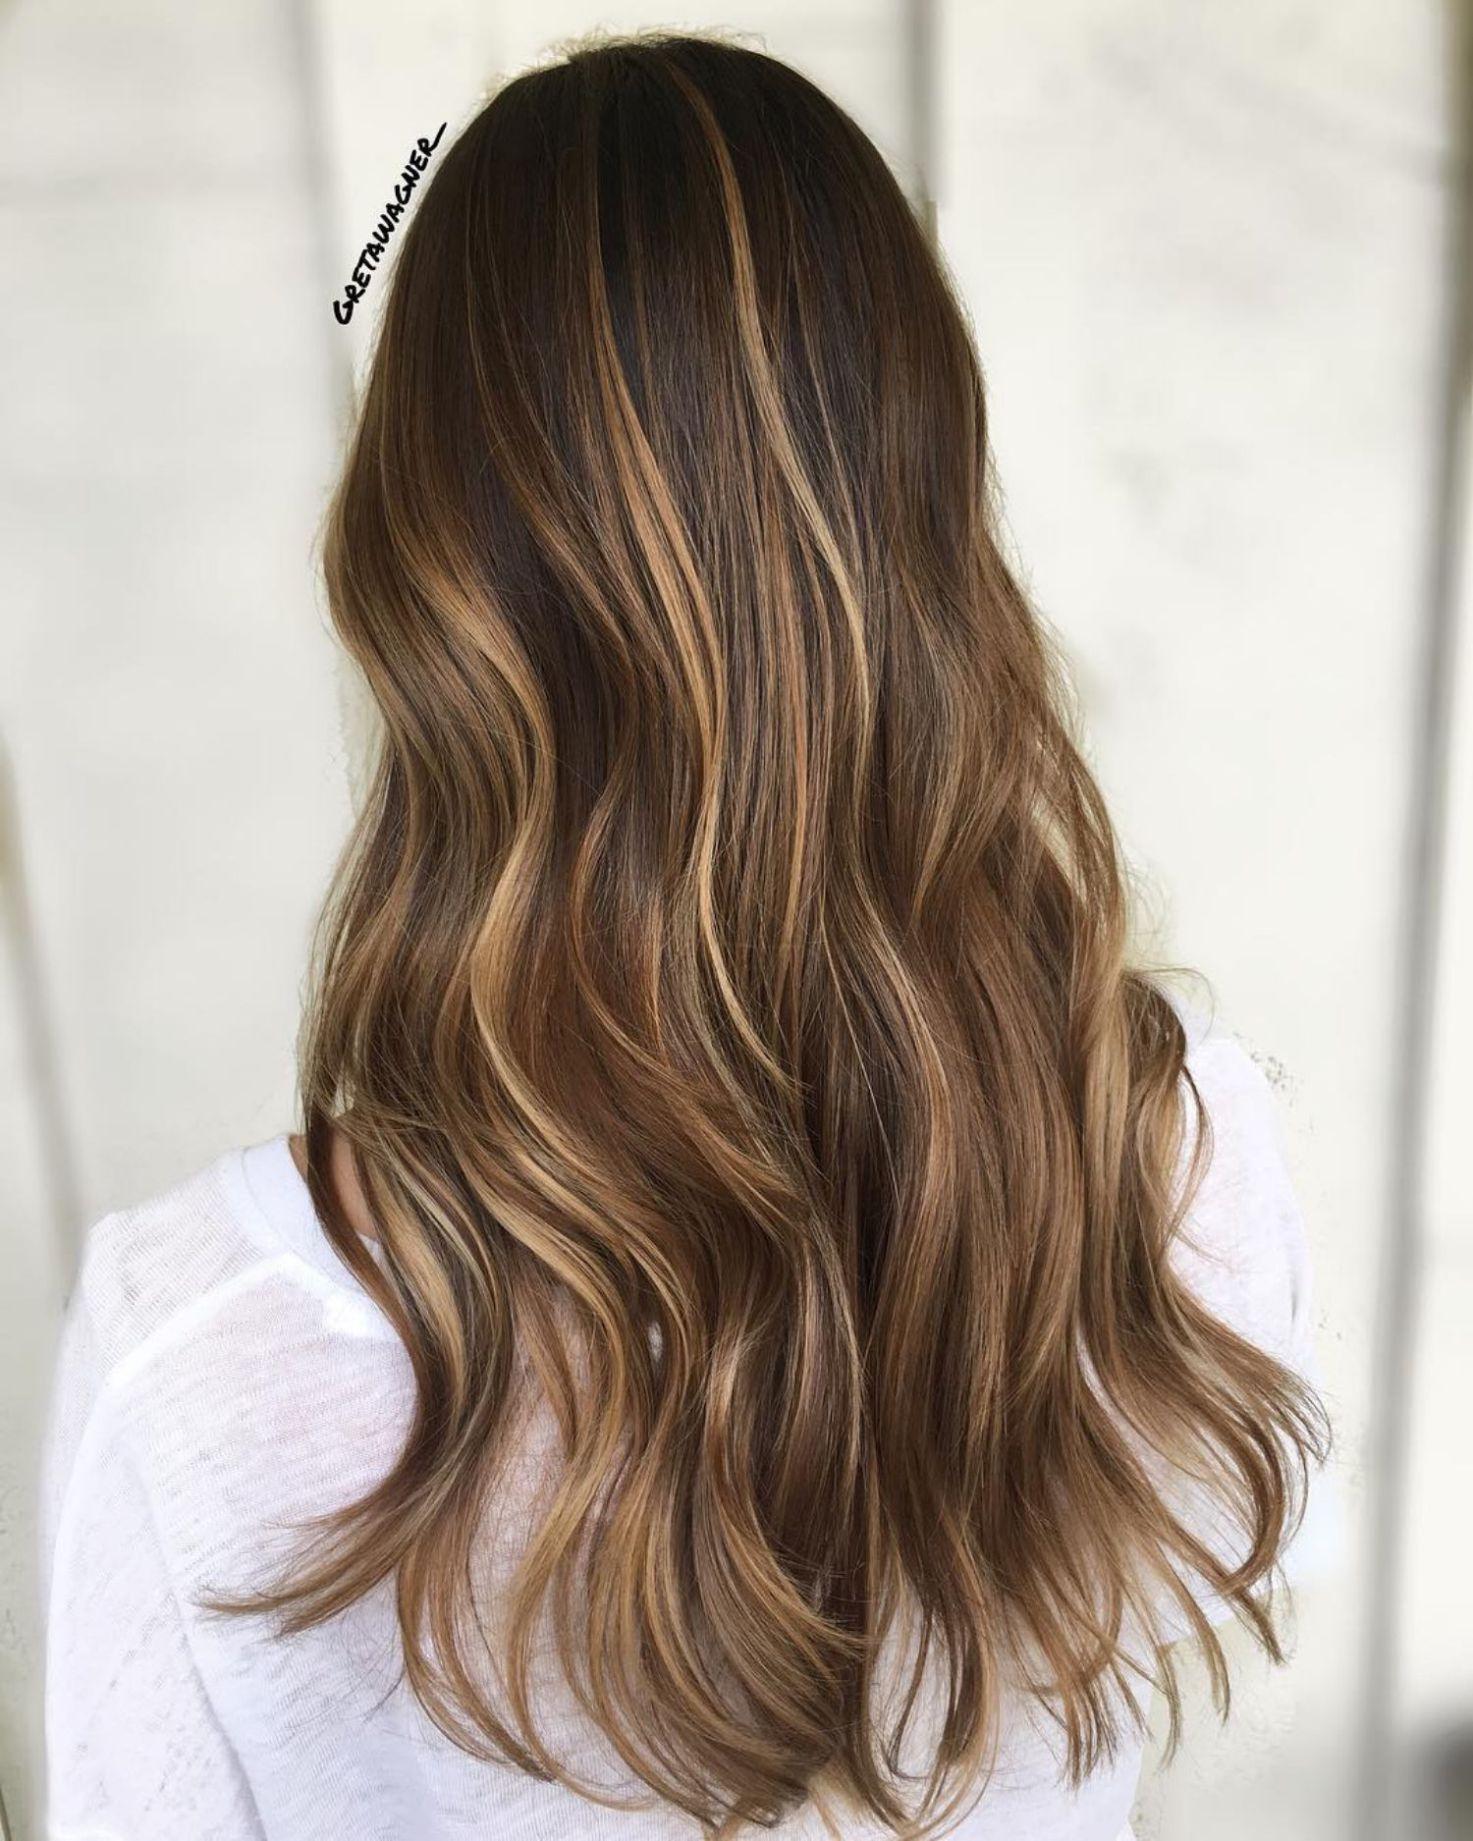 Long Brown Hair With Thin Highlights Brown Hair With Highlights Brown Hair With Highlights And Lowlights Hair Highlights